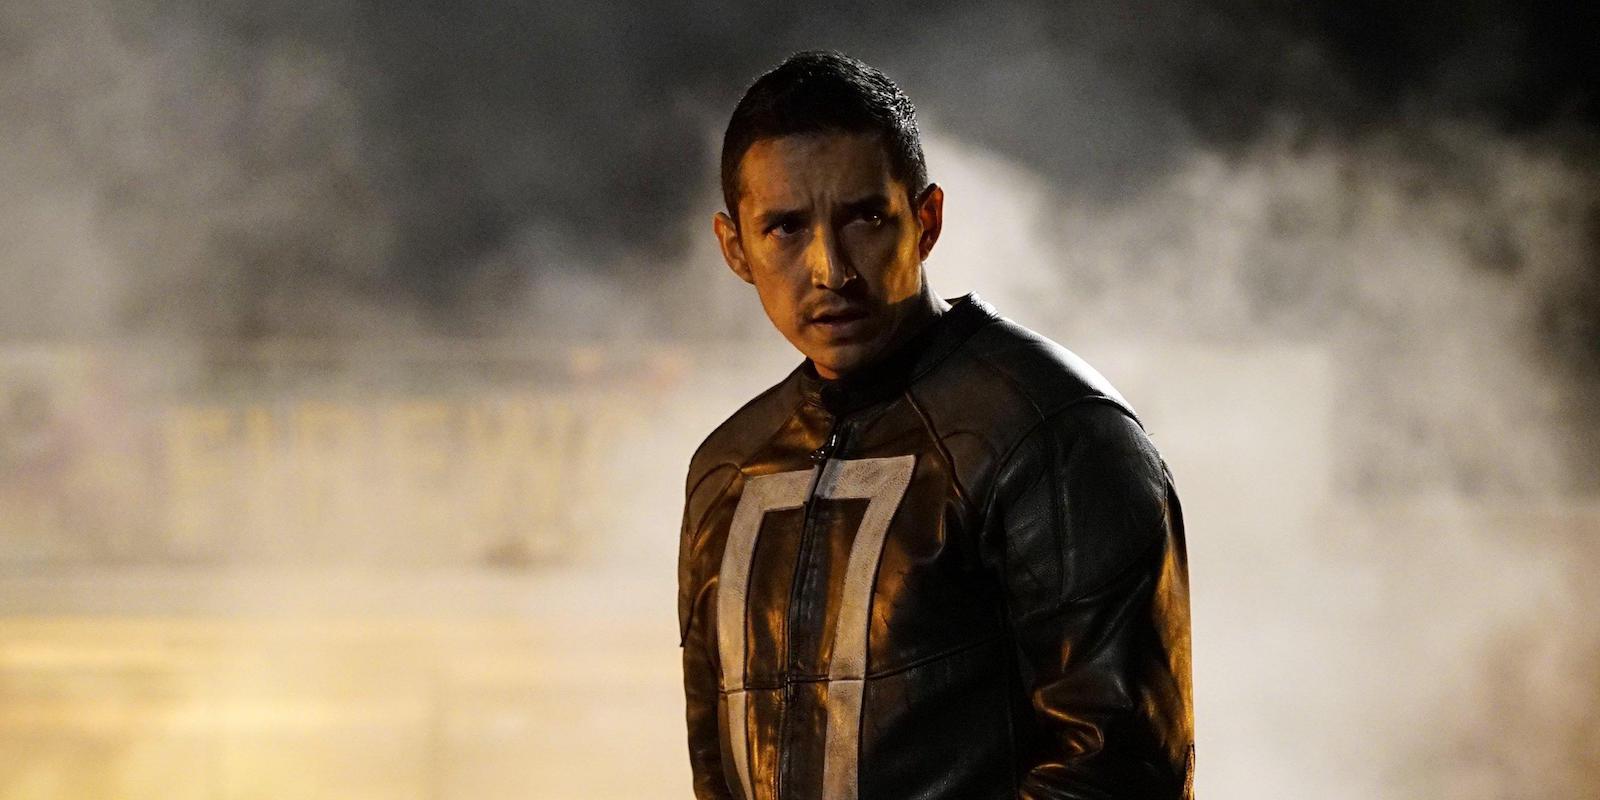 Gabriel Luna as Robbie Reyes Ghost Rider in Agents of Shield season 4